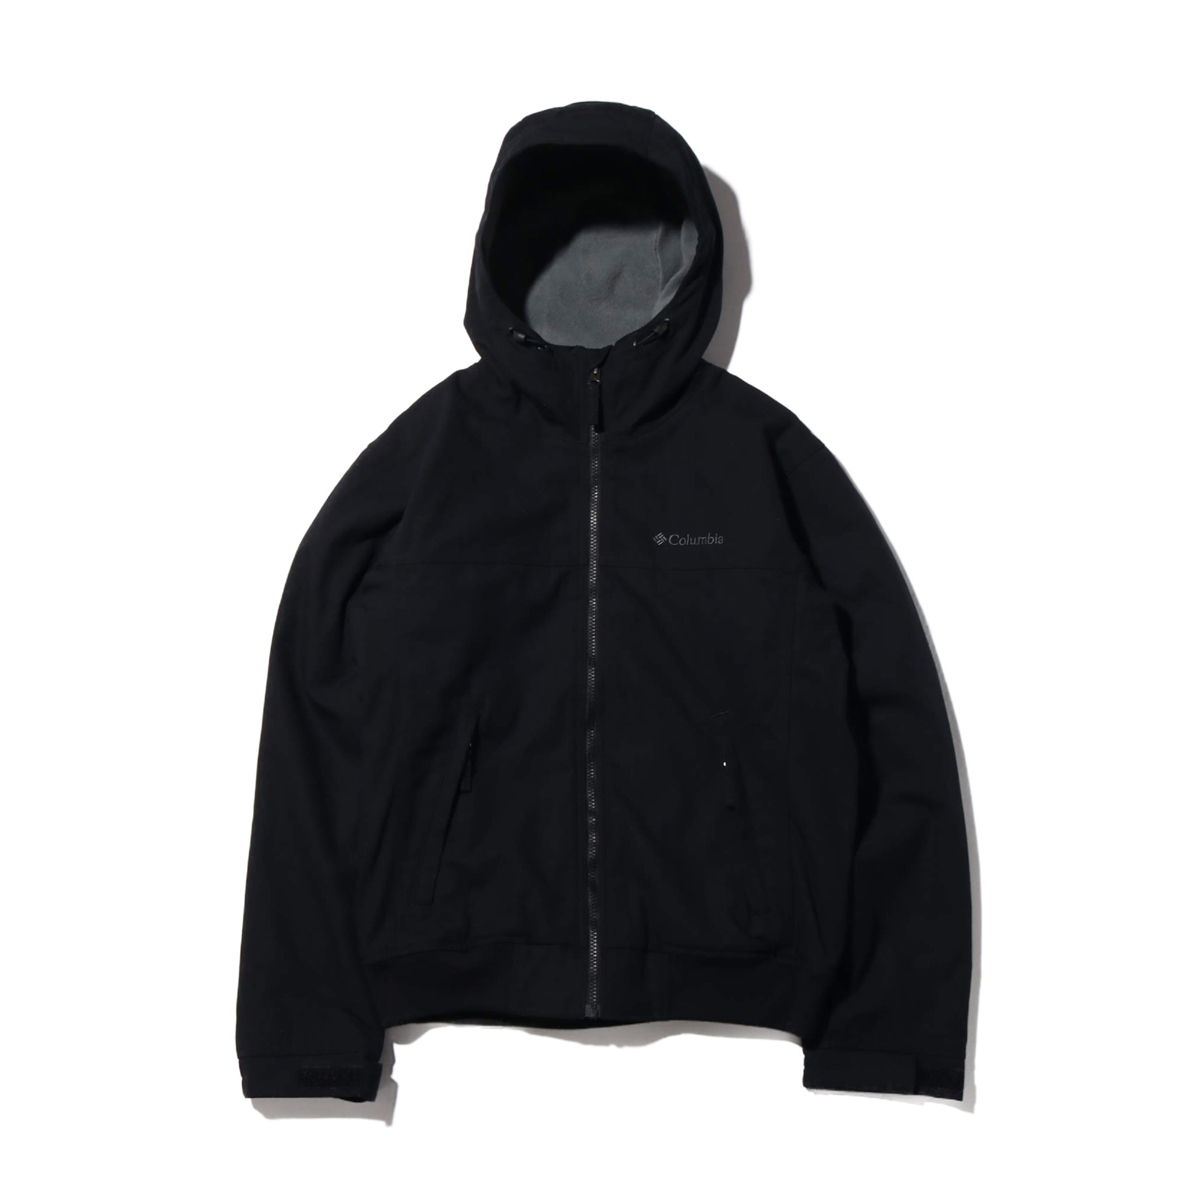 Columbia Loma Vista™ Hoodie(Black)(コロンビア ロマビスタ フーディー)【メンズ】【パーカー】【19FA-I】